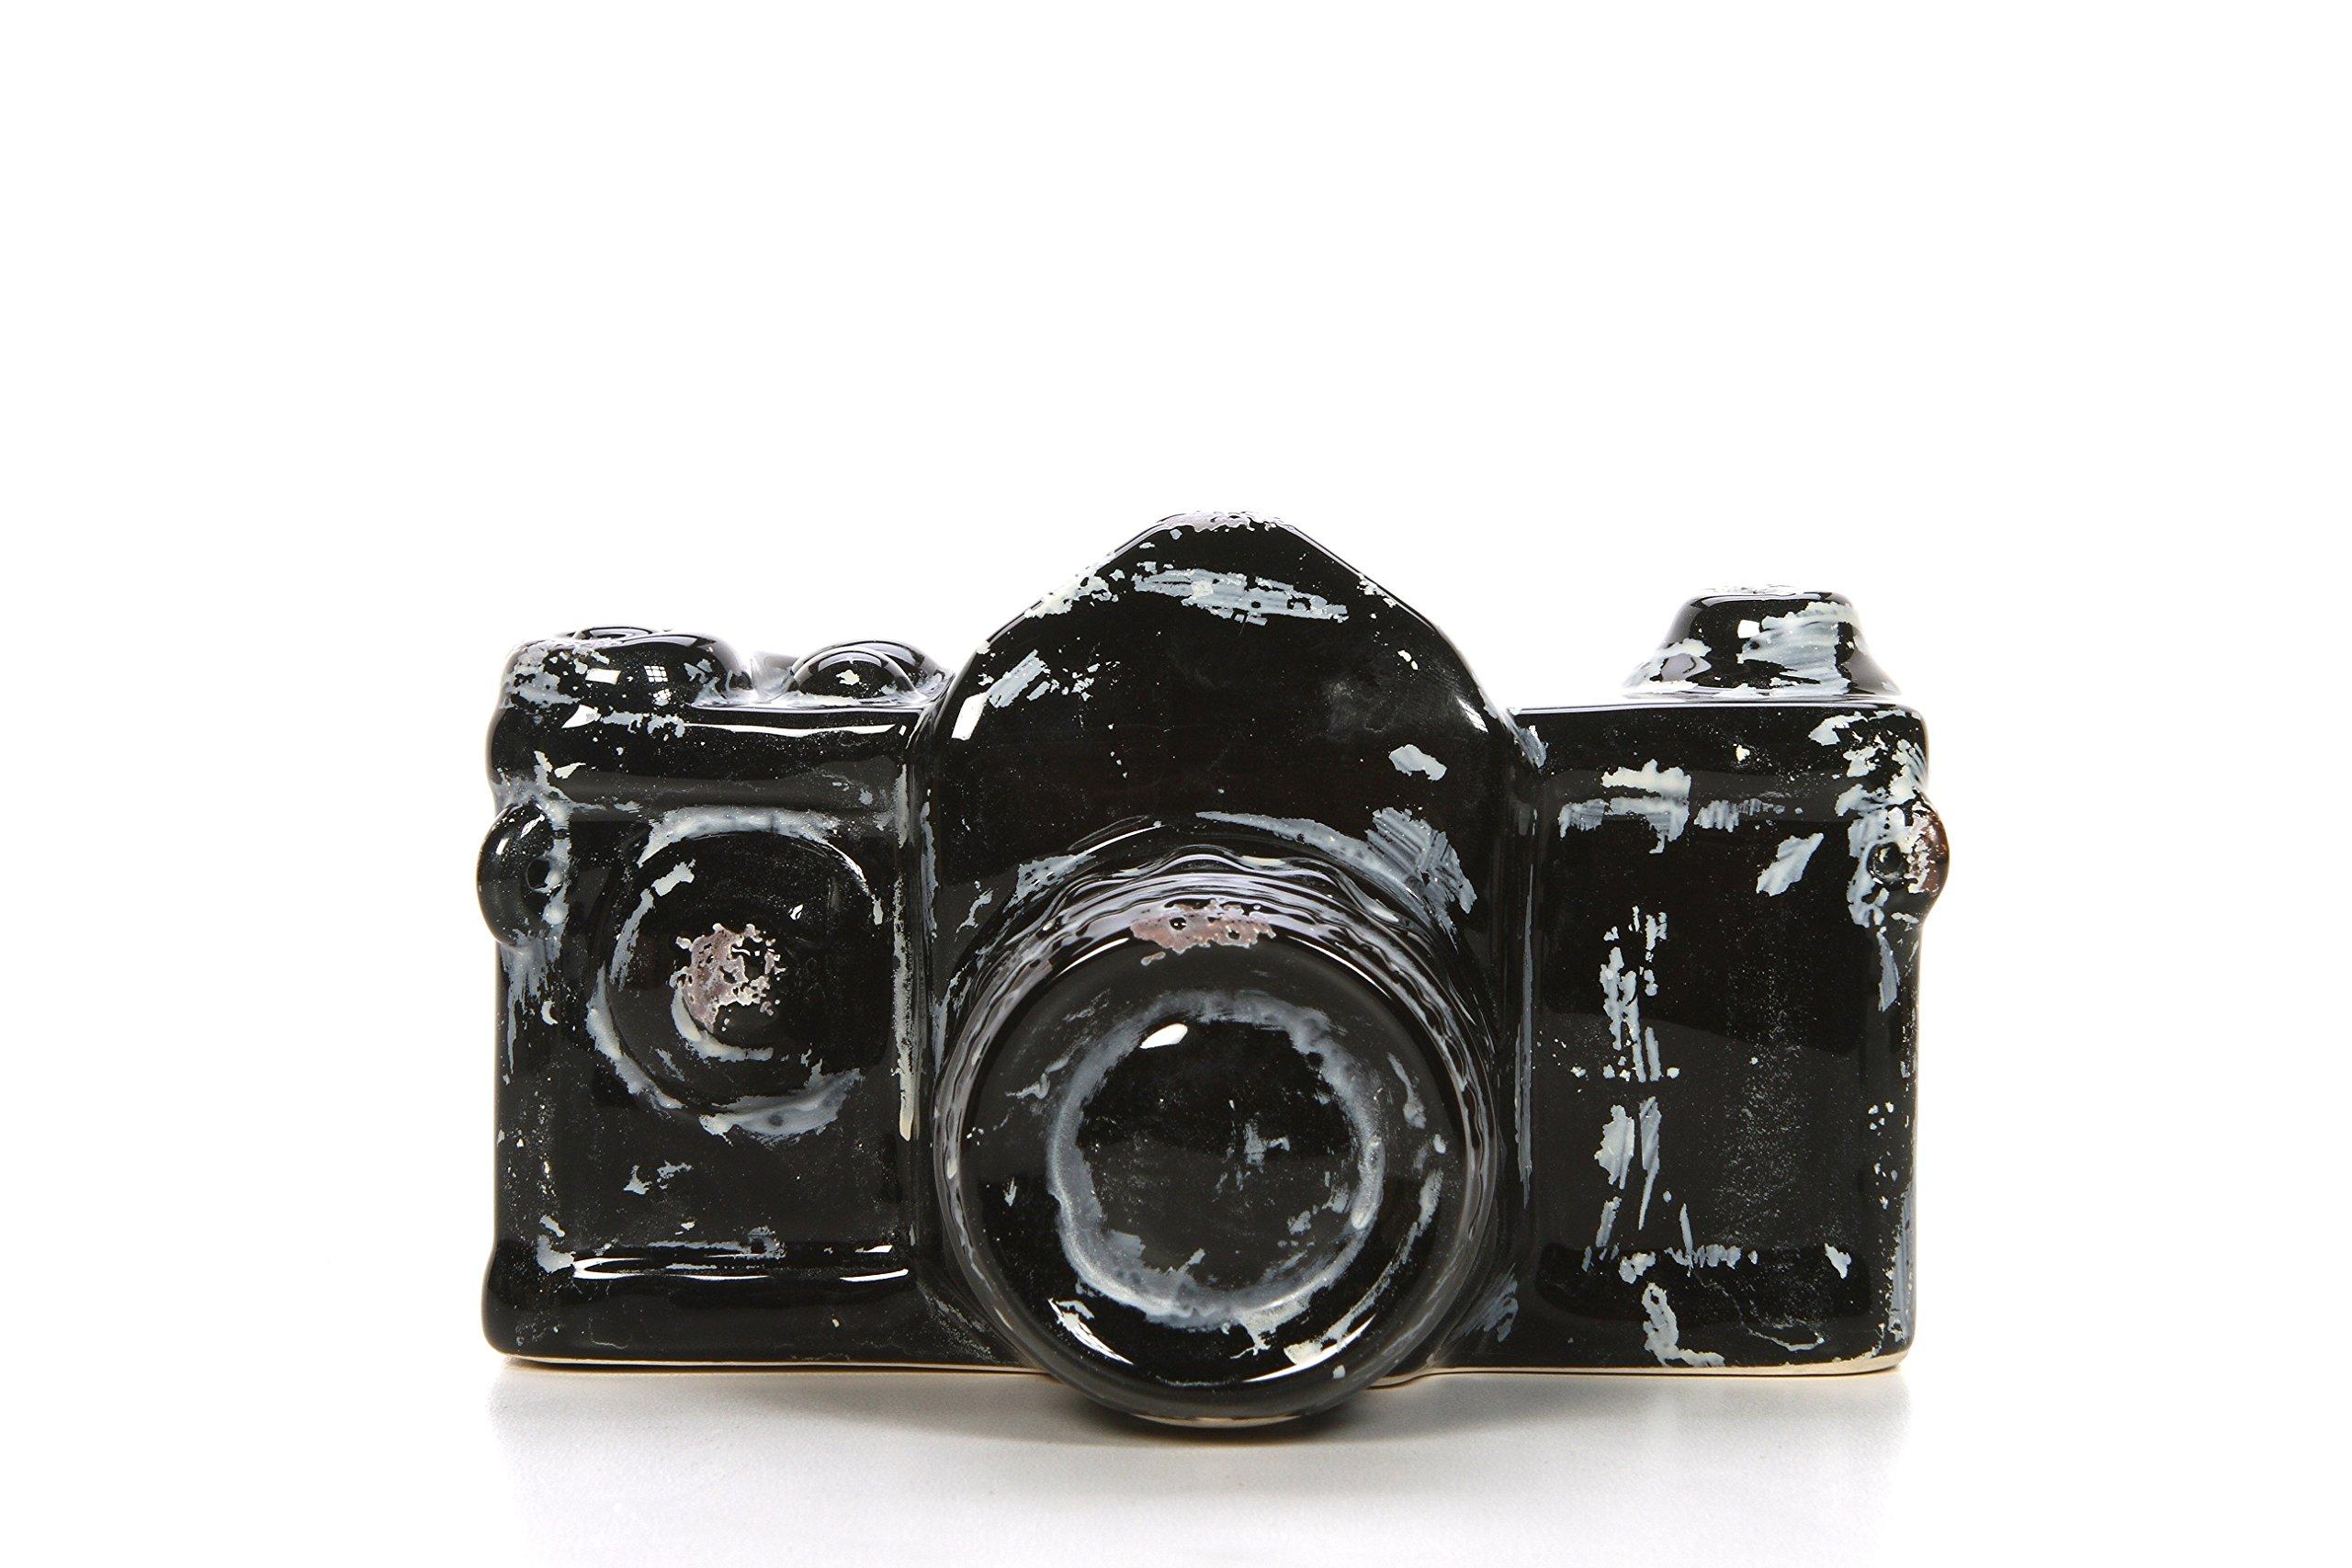 Hosley 4'' High, Decorative Tabletop Ceramic Camera, Black. Ideal Gift for Wedding, Photographer, Home, Party Favor, Spa, Reiki, Meditation, Bathroom Settings P1